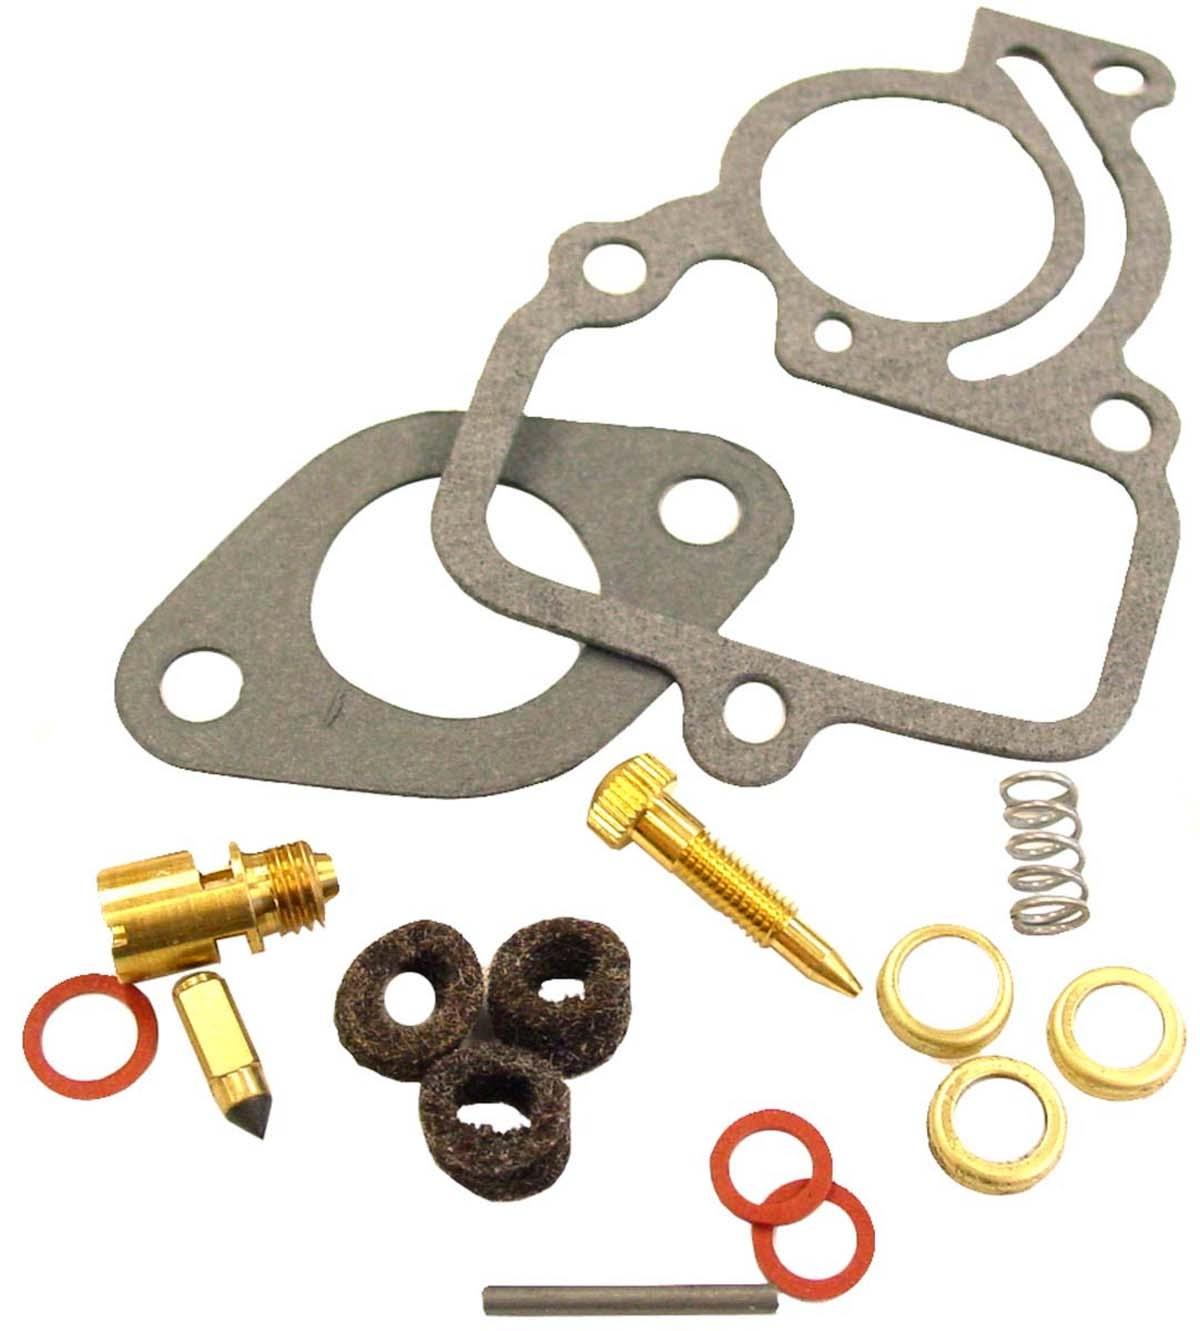 Carb rebuild kit for Cub with carburetor 251234R94, or 364579R91